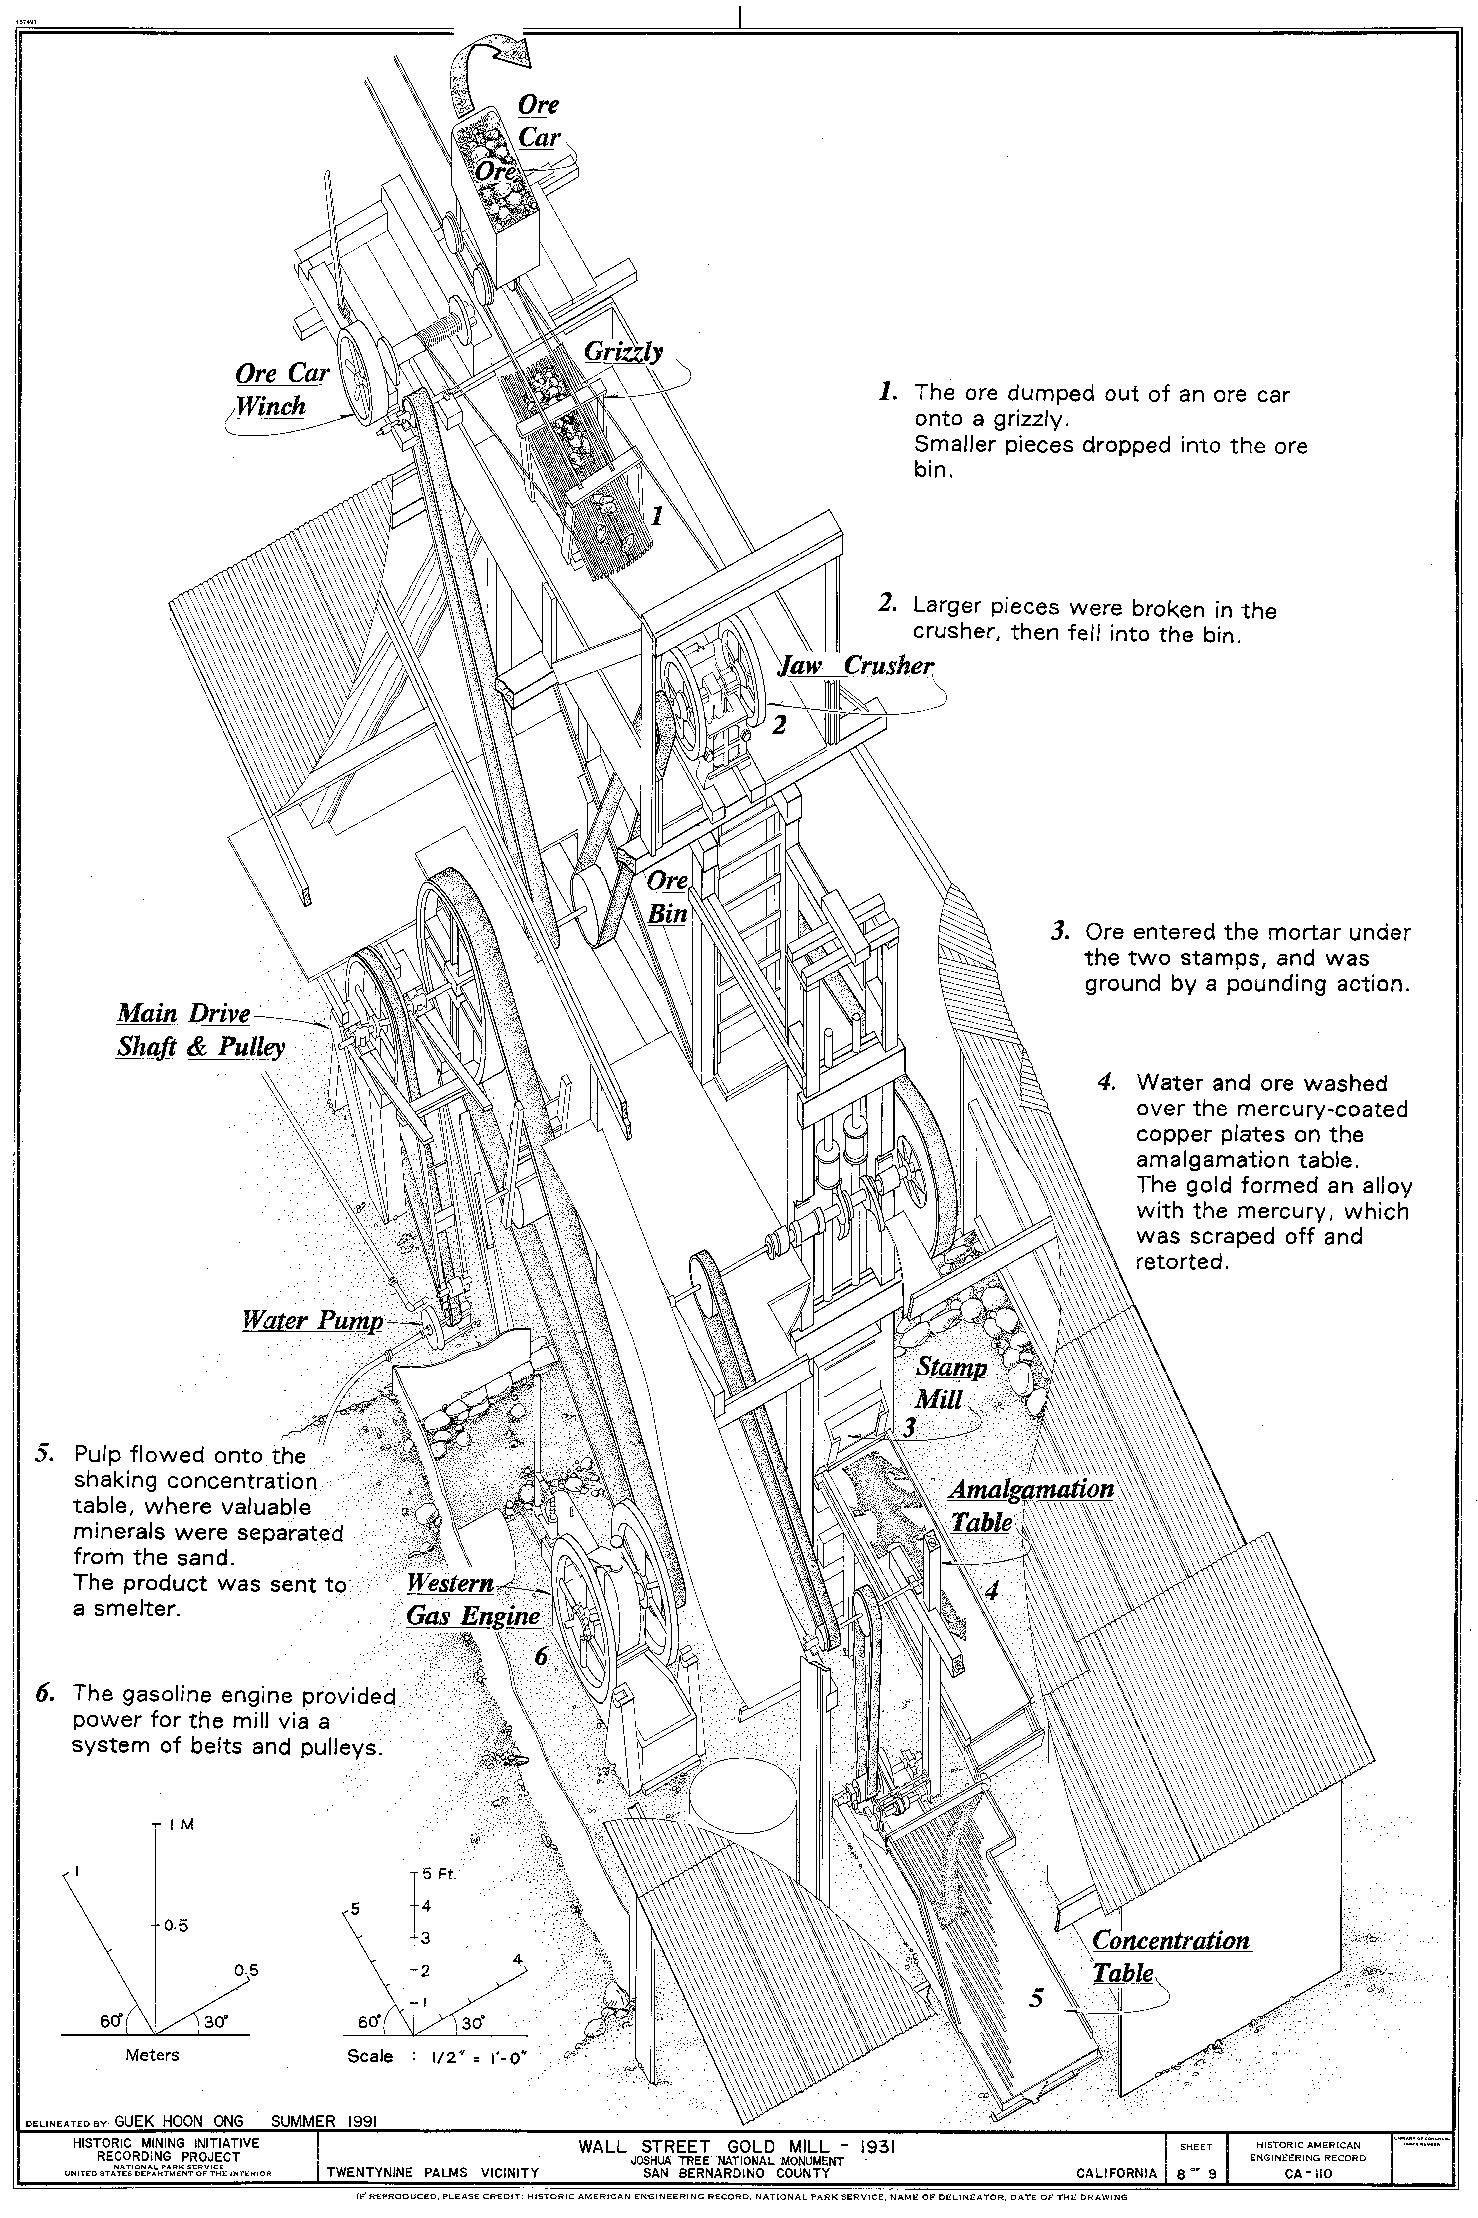 Credit: Historic American Engineering Record, National Park Service, Guek Hoon Ong, 1991.